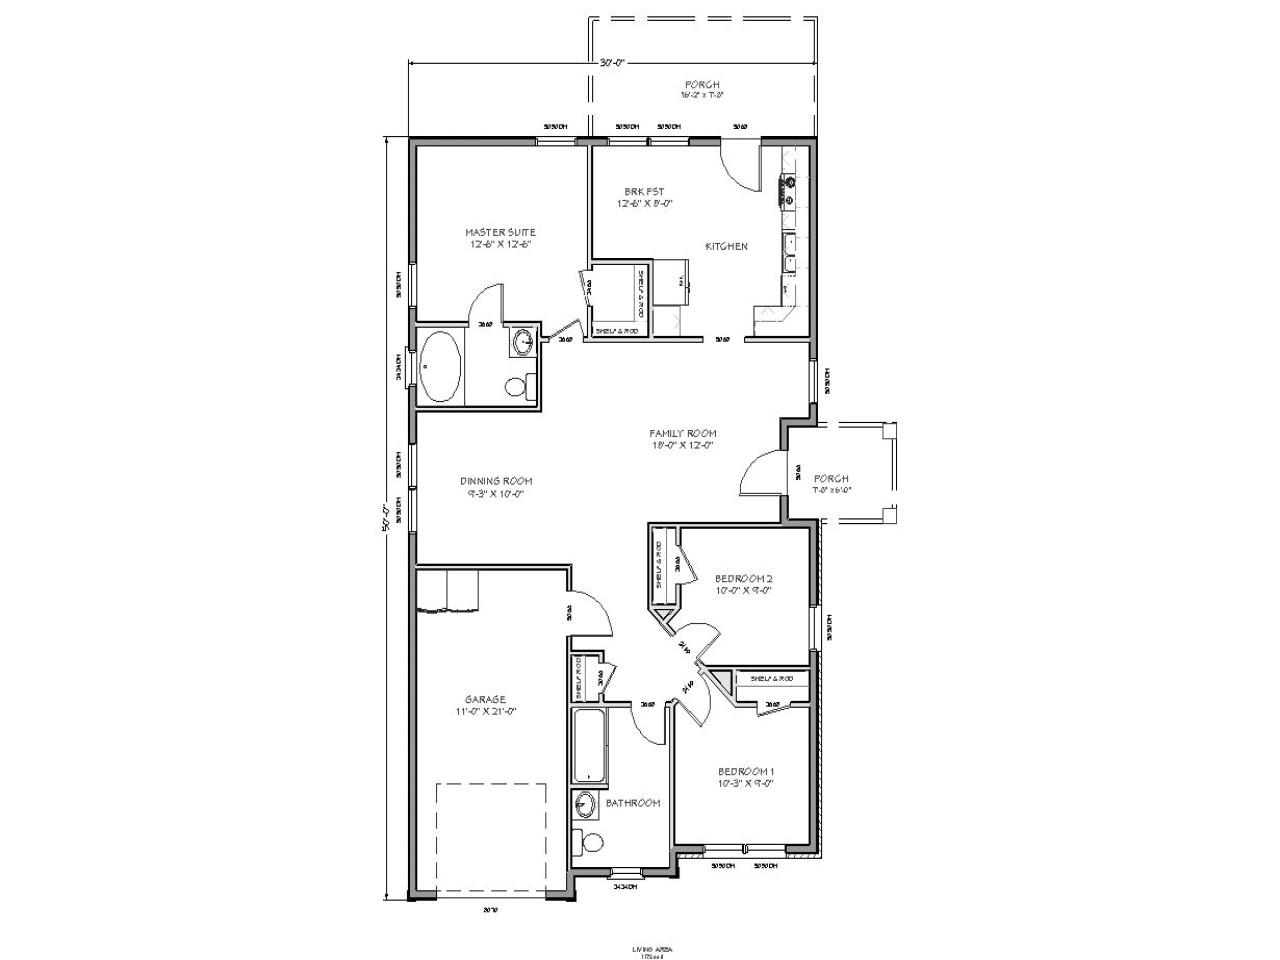 da78c565458bbb0c small house floor plan modern small house plans